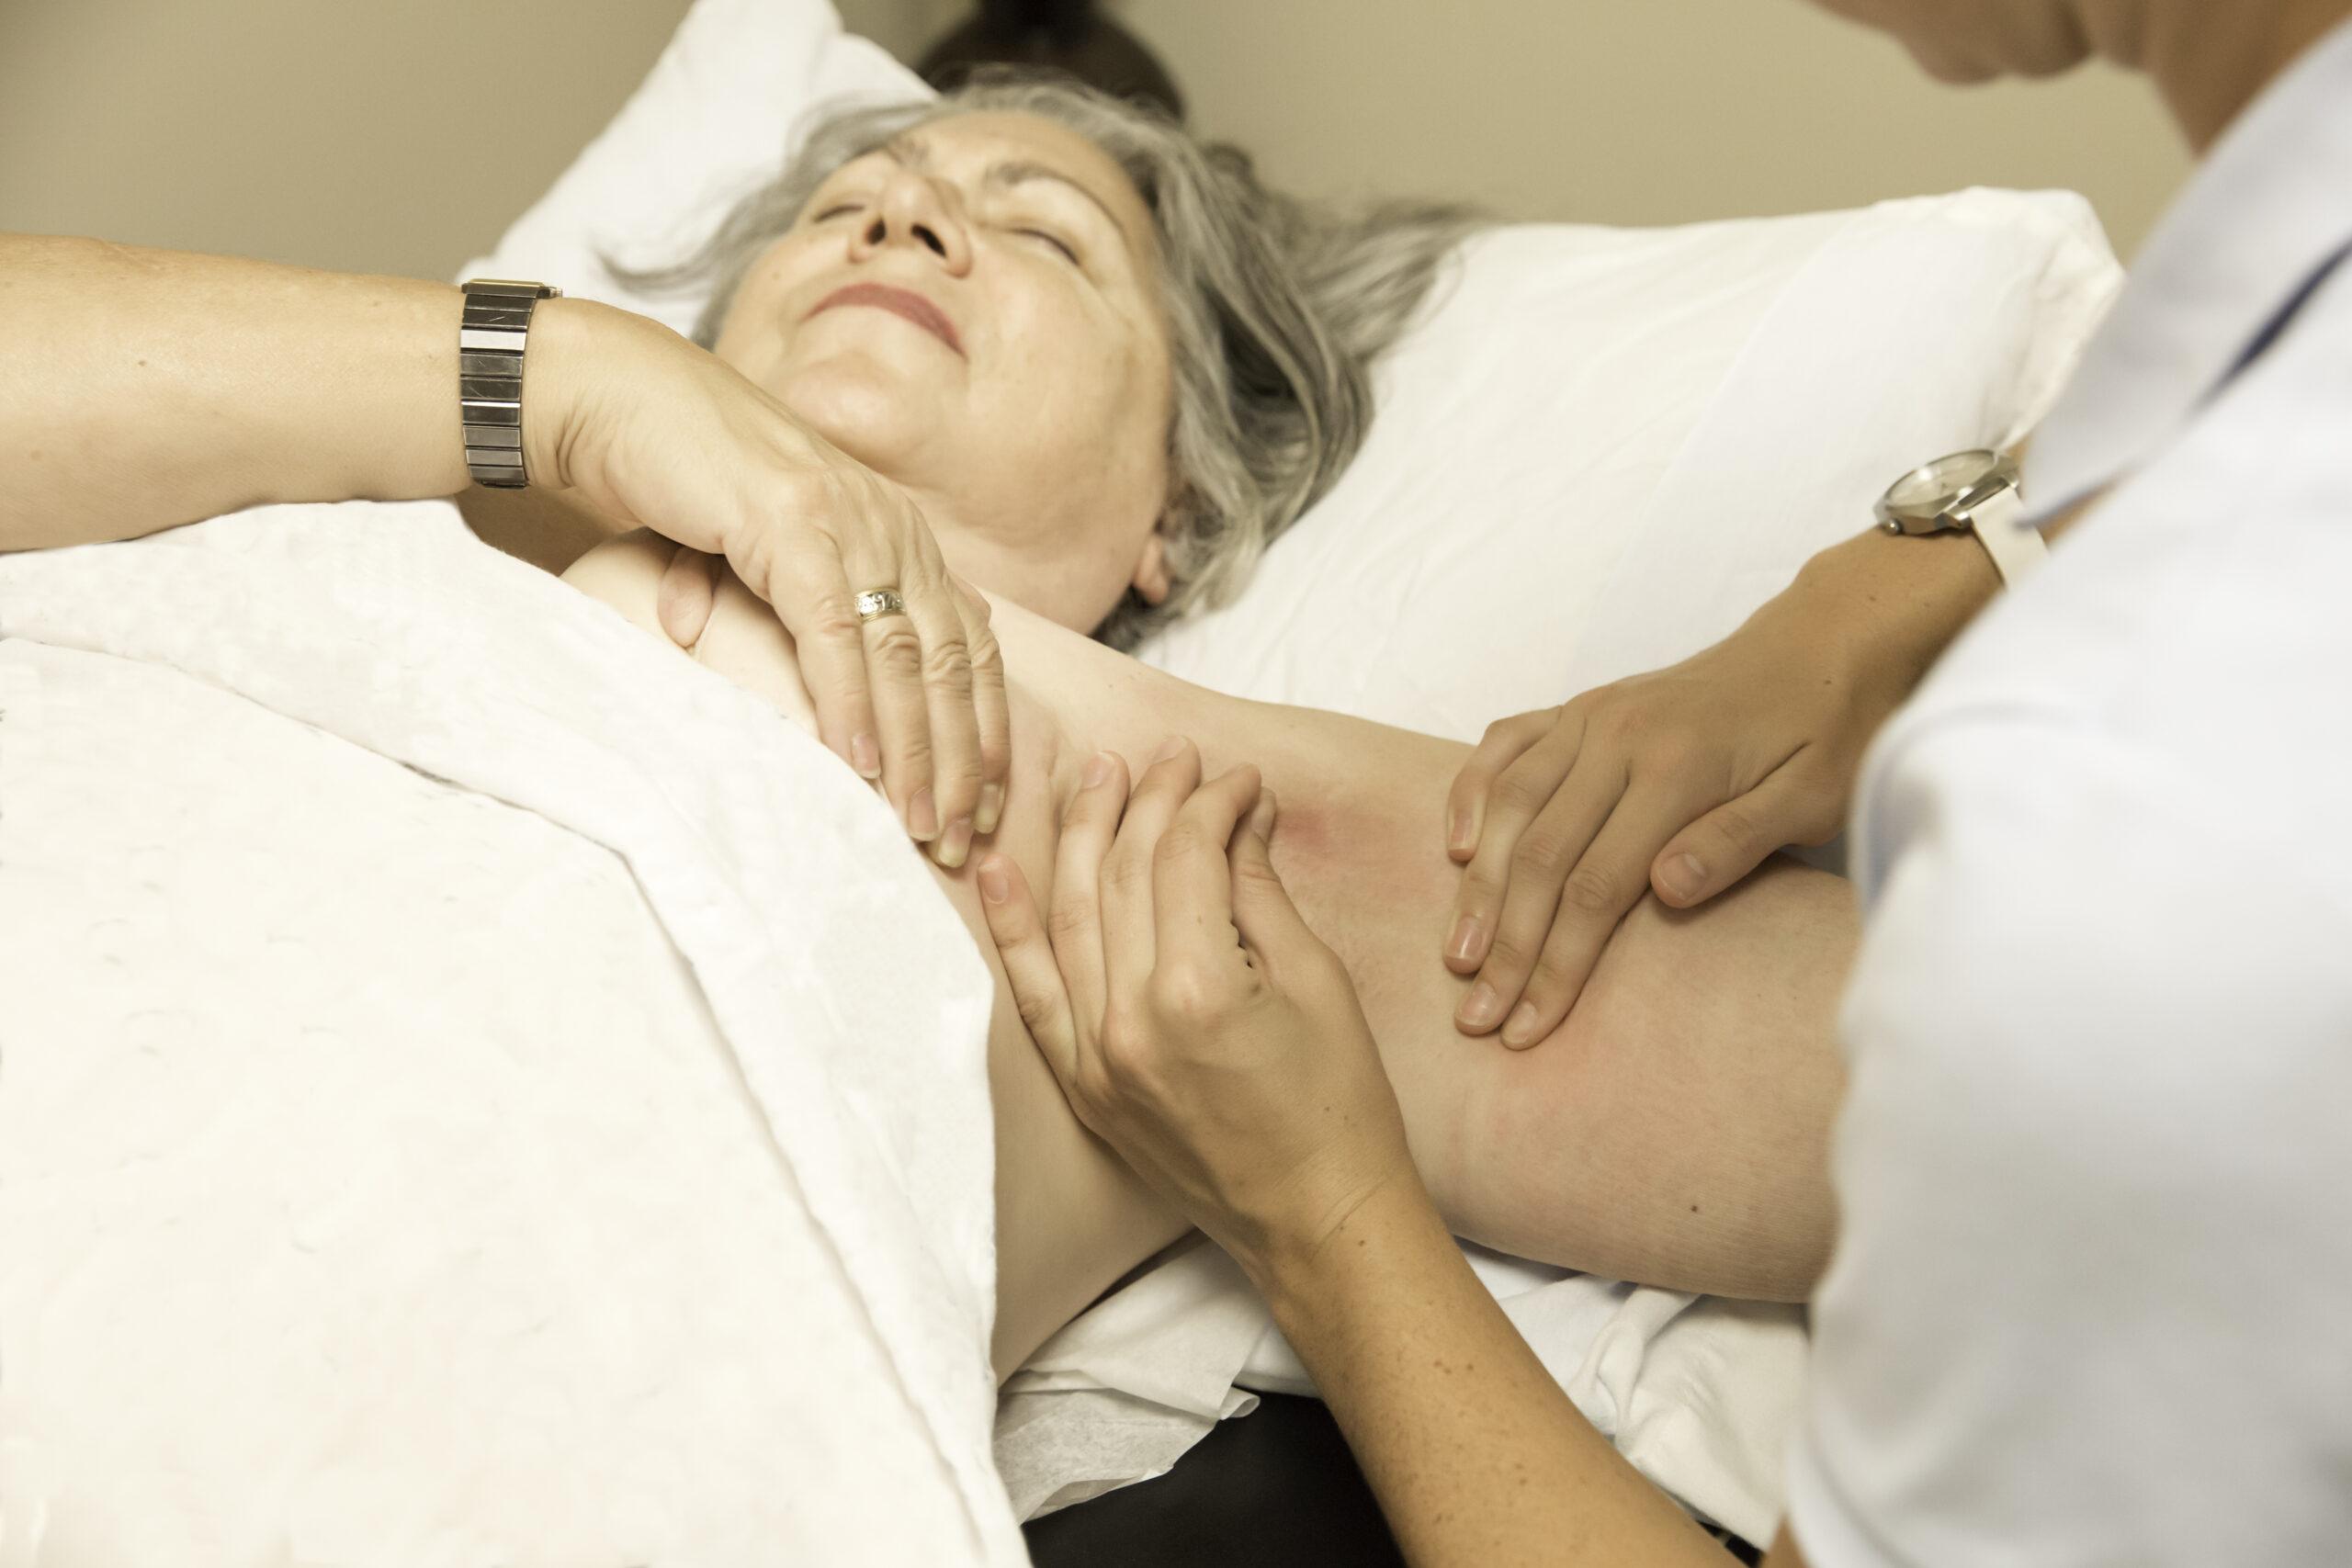 A professional lymphatic massage